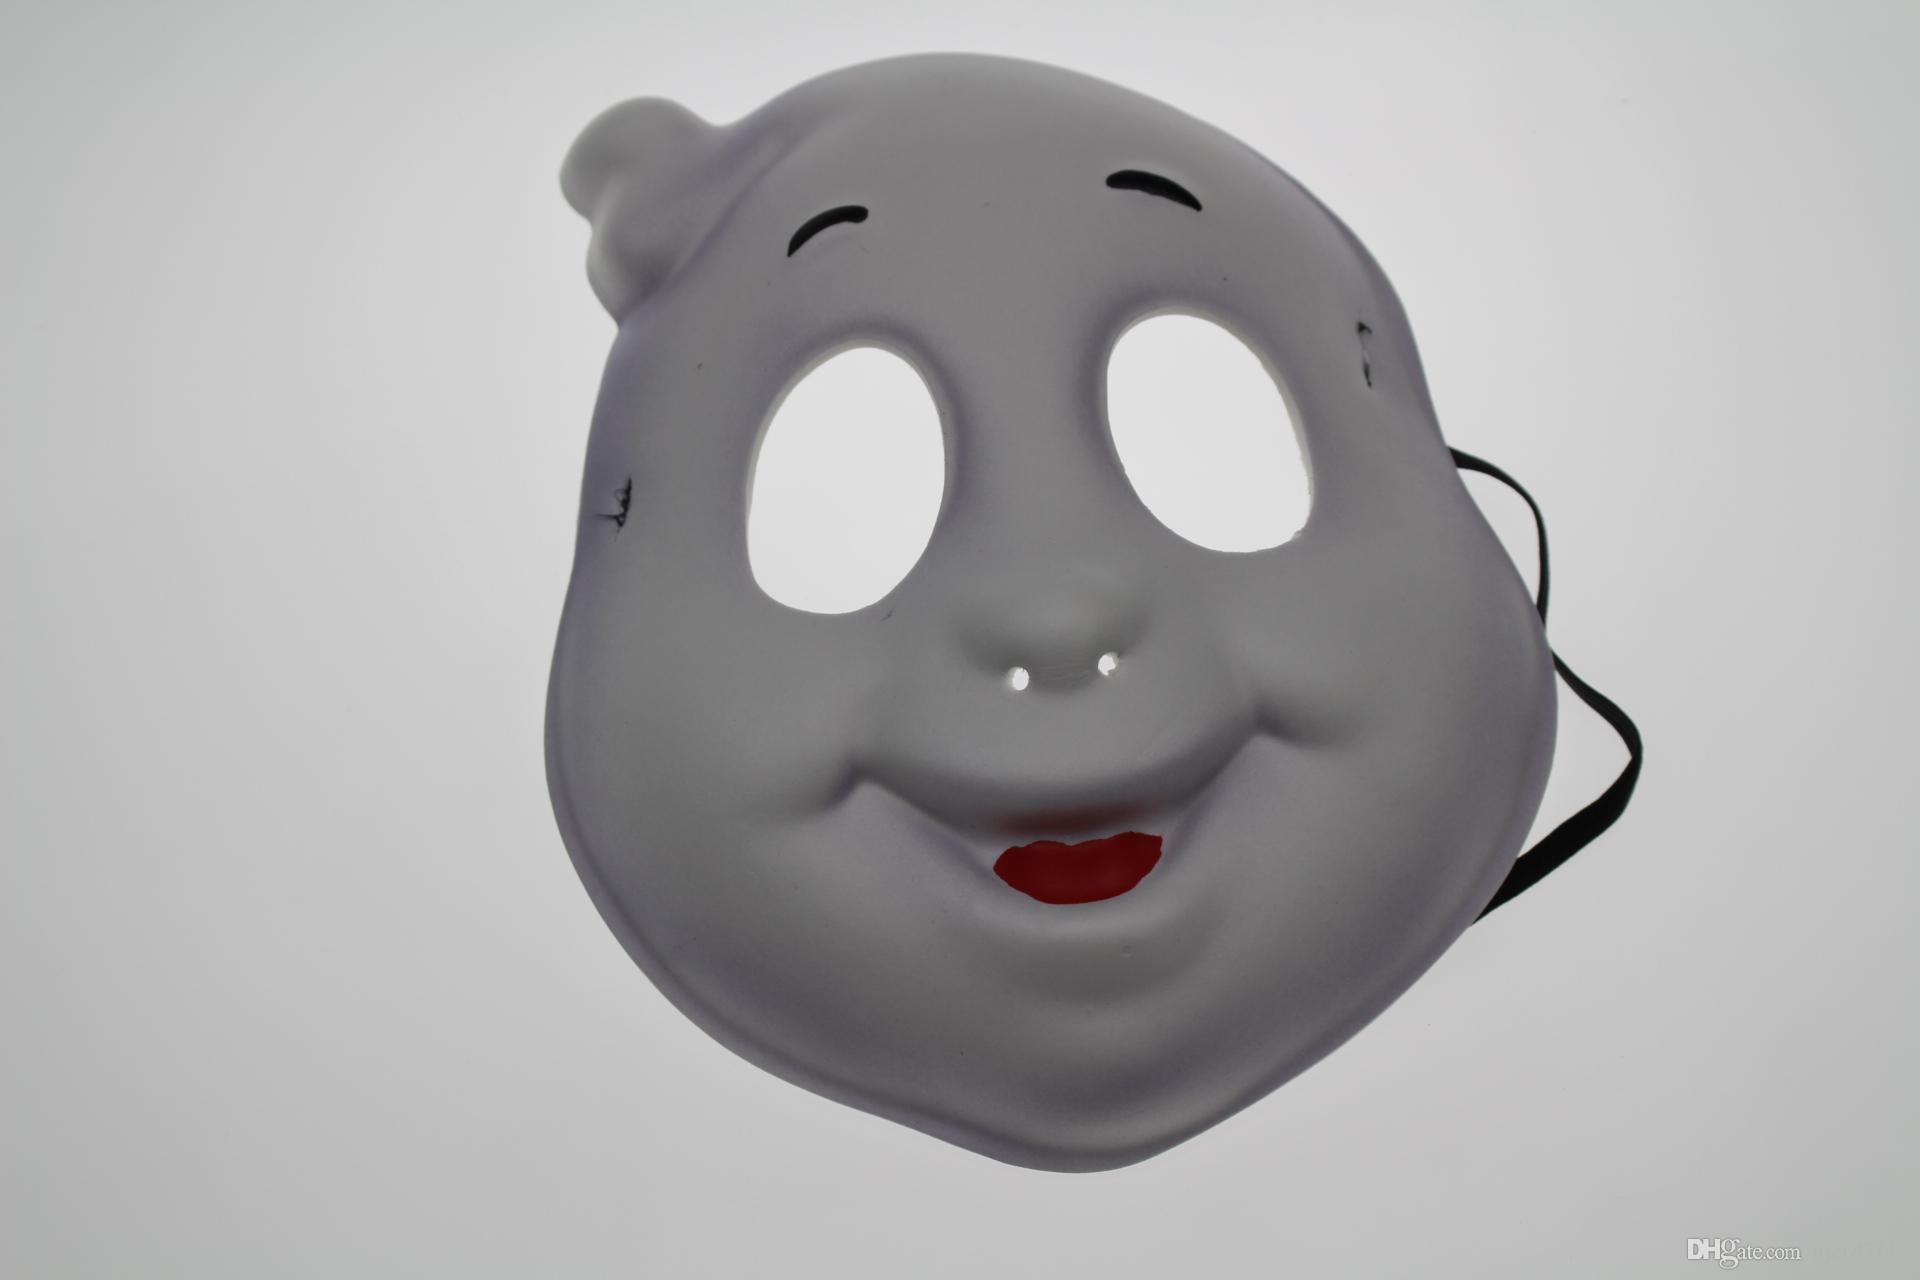 Festa de Halloween vestido palco desempenho festival máscara Uma orelha branca fantasma máscara de festa de aniversário masquerade EVA ambientalmente amigável